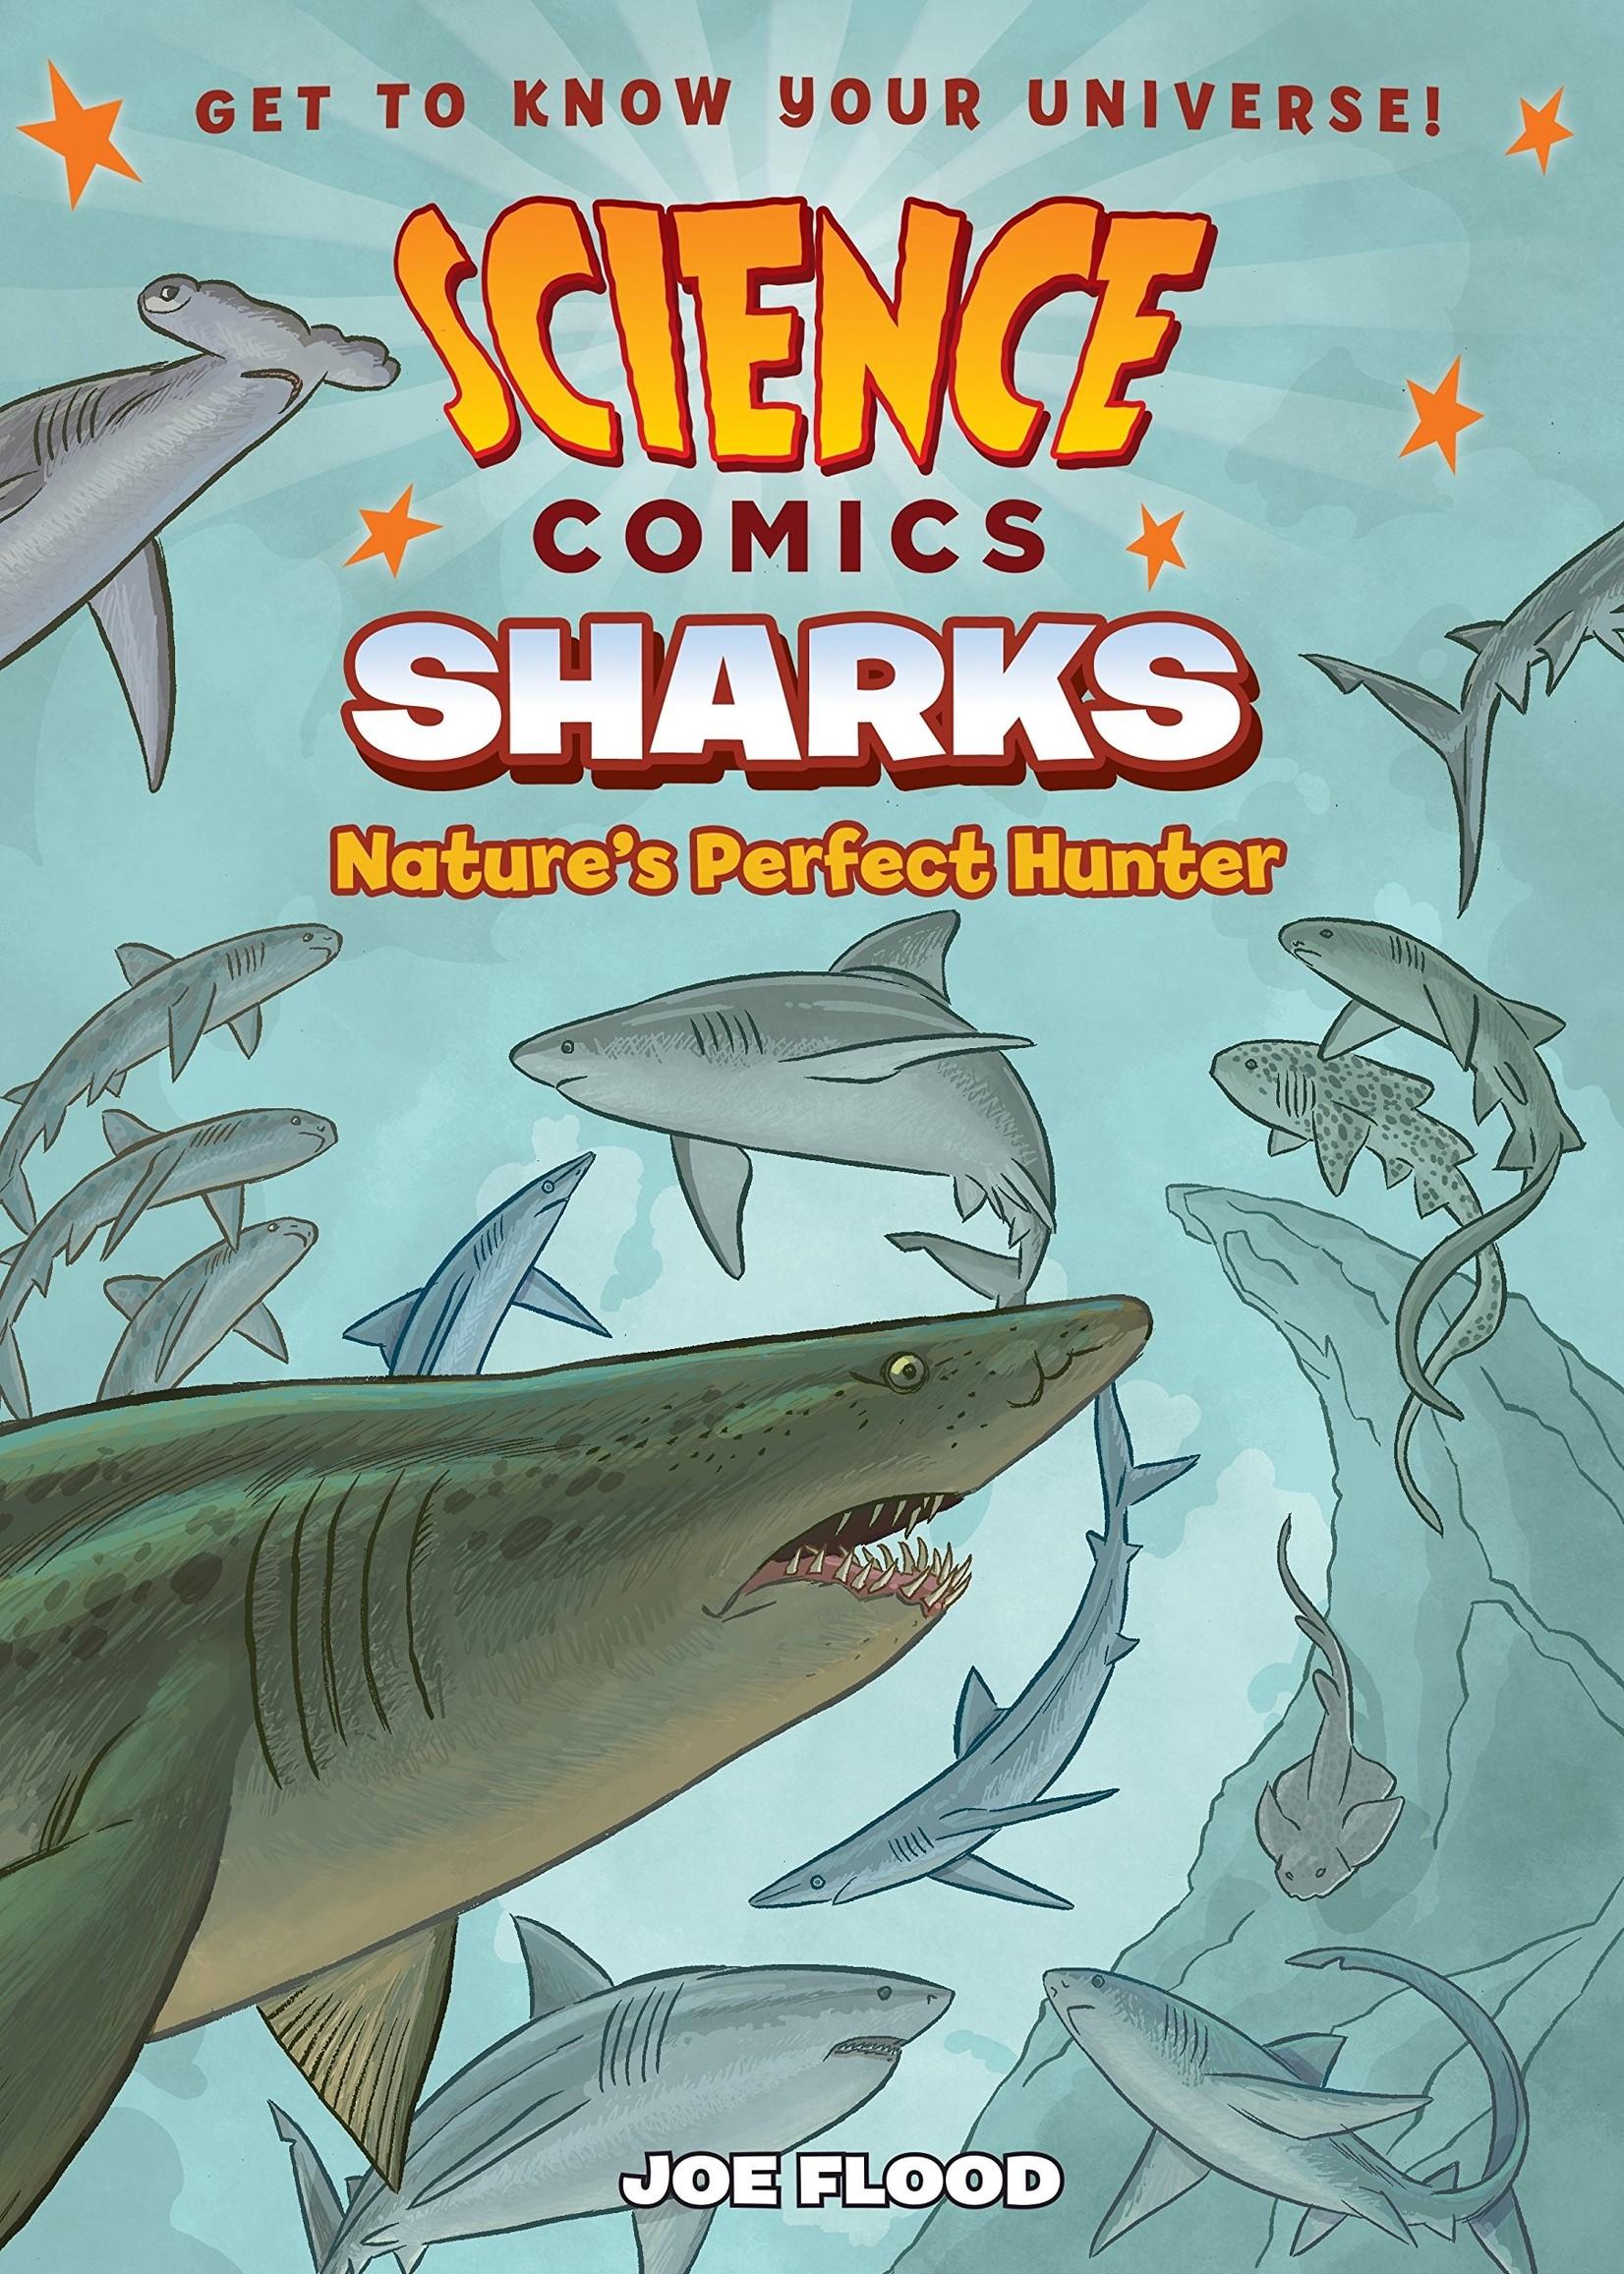 Science Comics: Sharks, Nature's Perfect Hunter Graphic Novel - Paperback